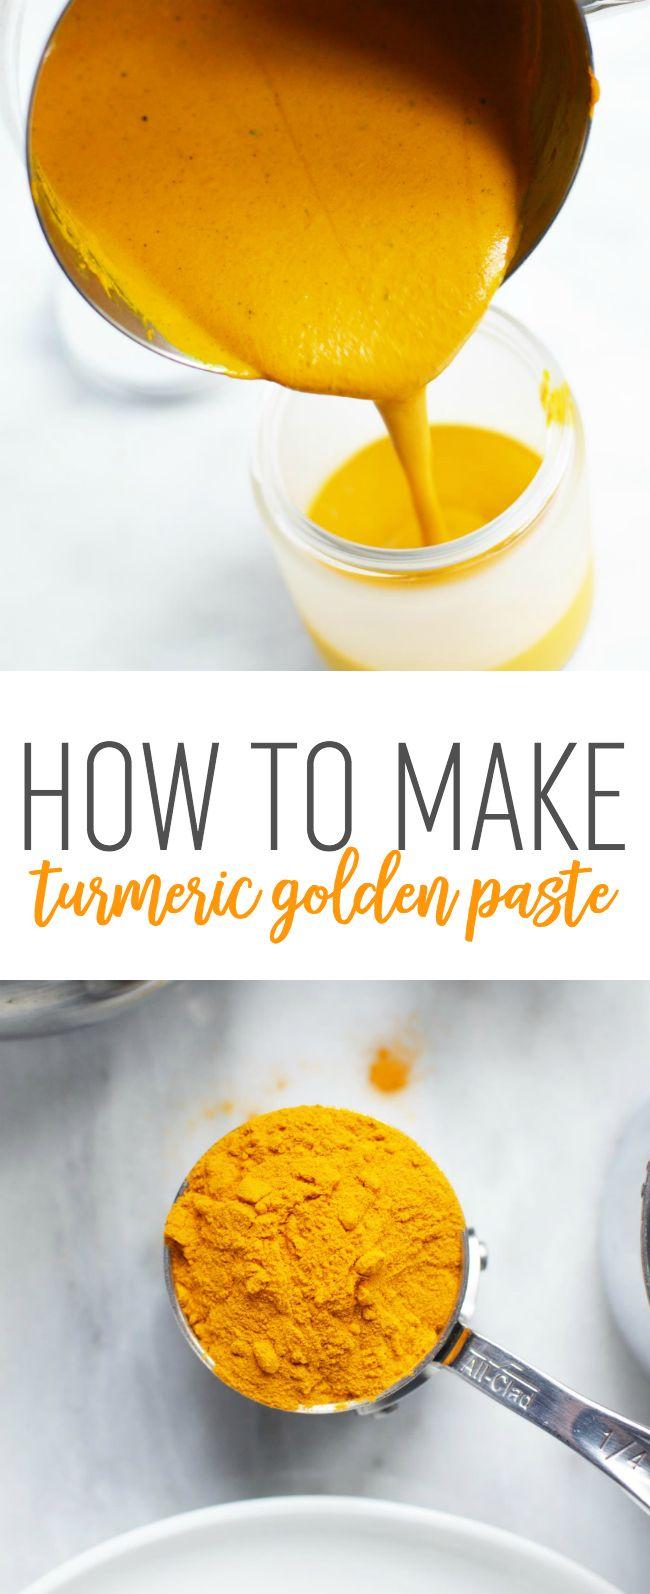 DIY Turmeric Golden Paste - How to make turmeric golden paste and how you can use it to make healthy golden milk!